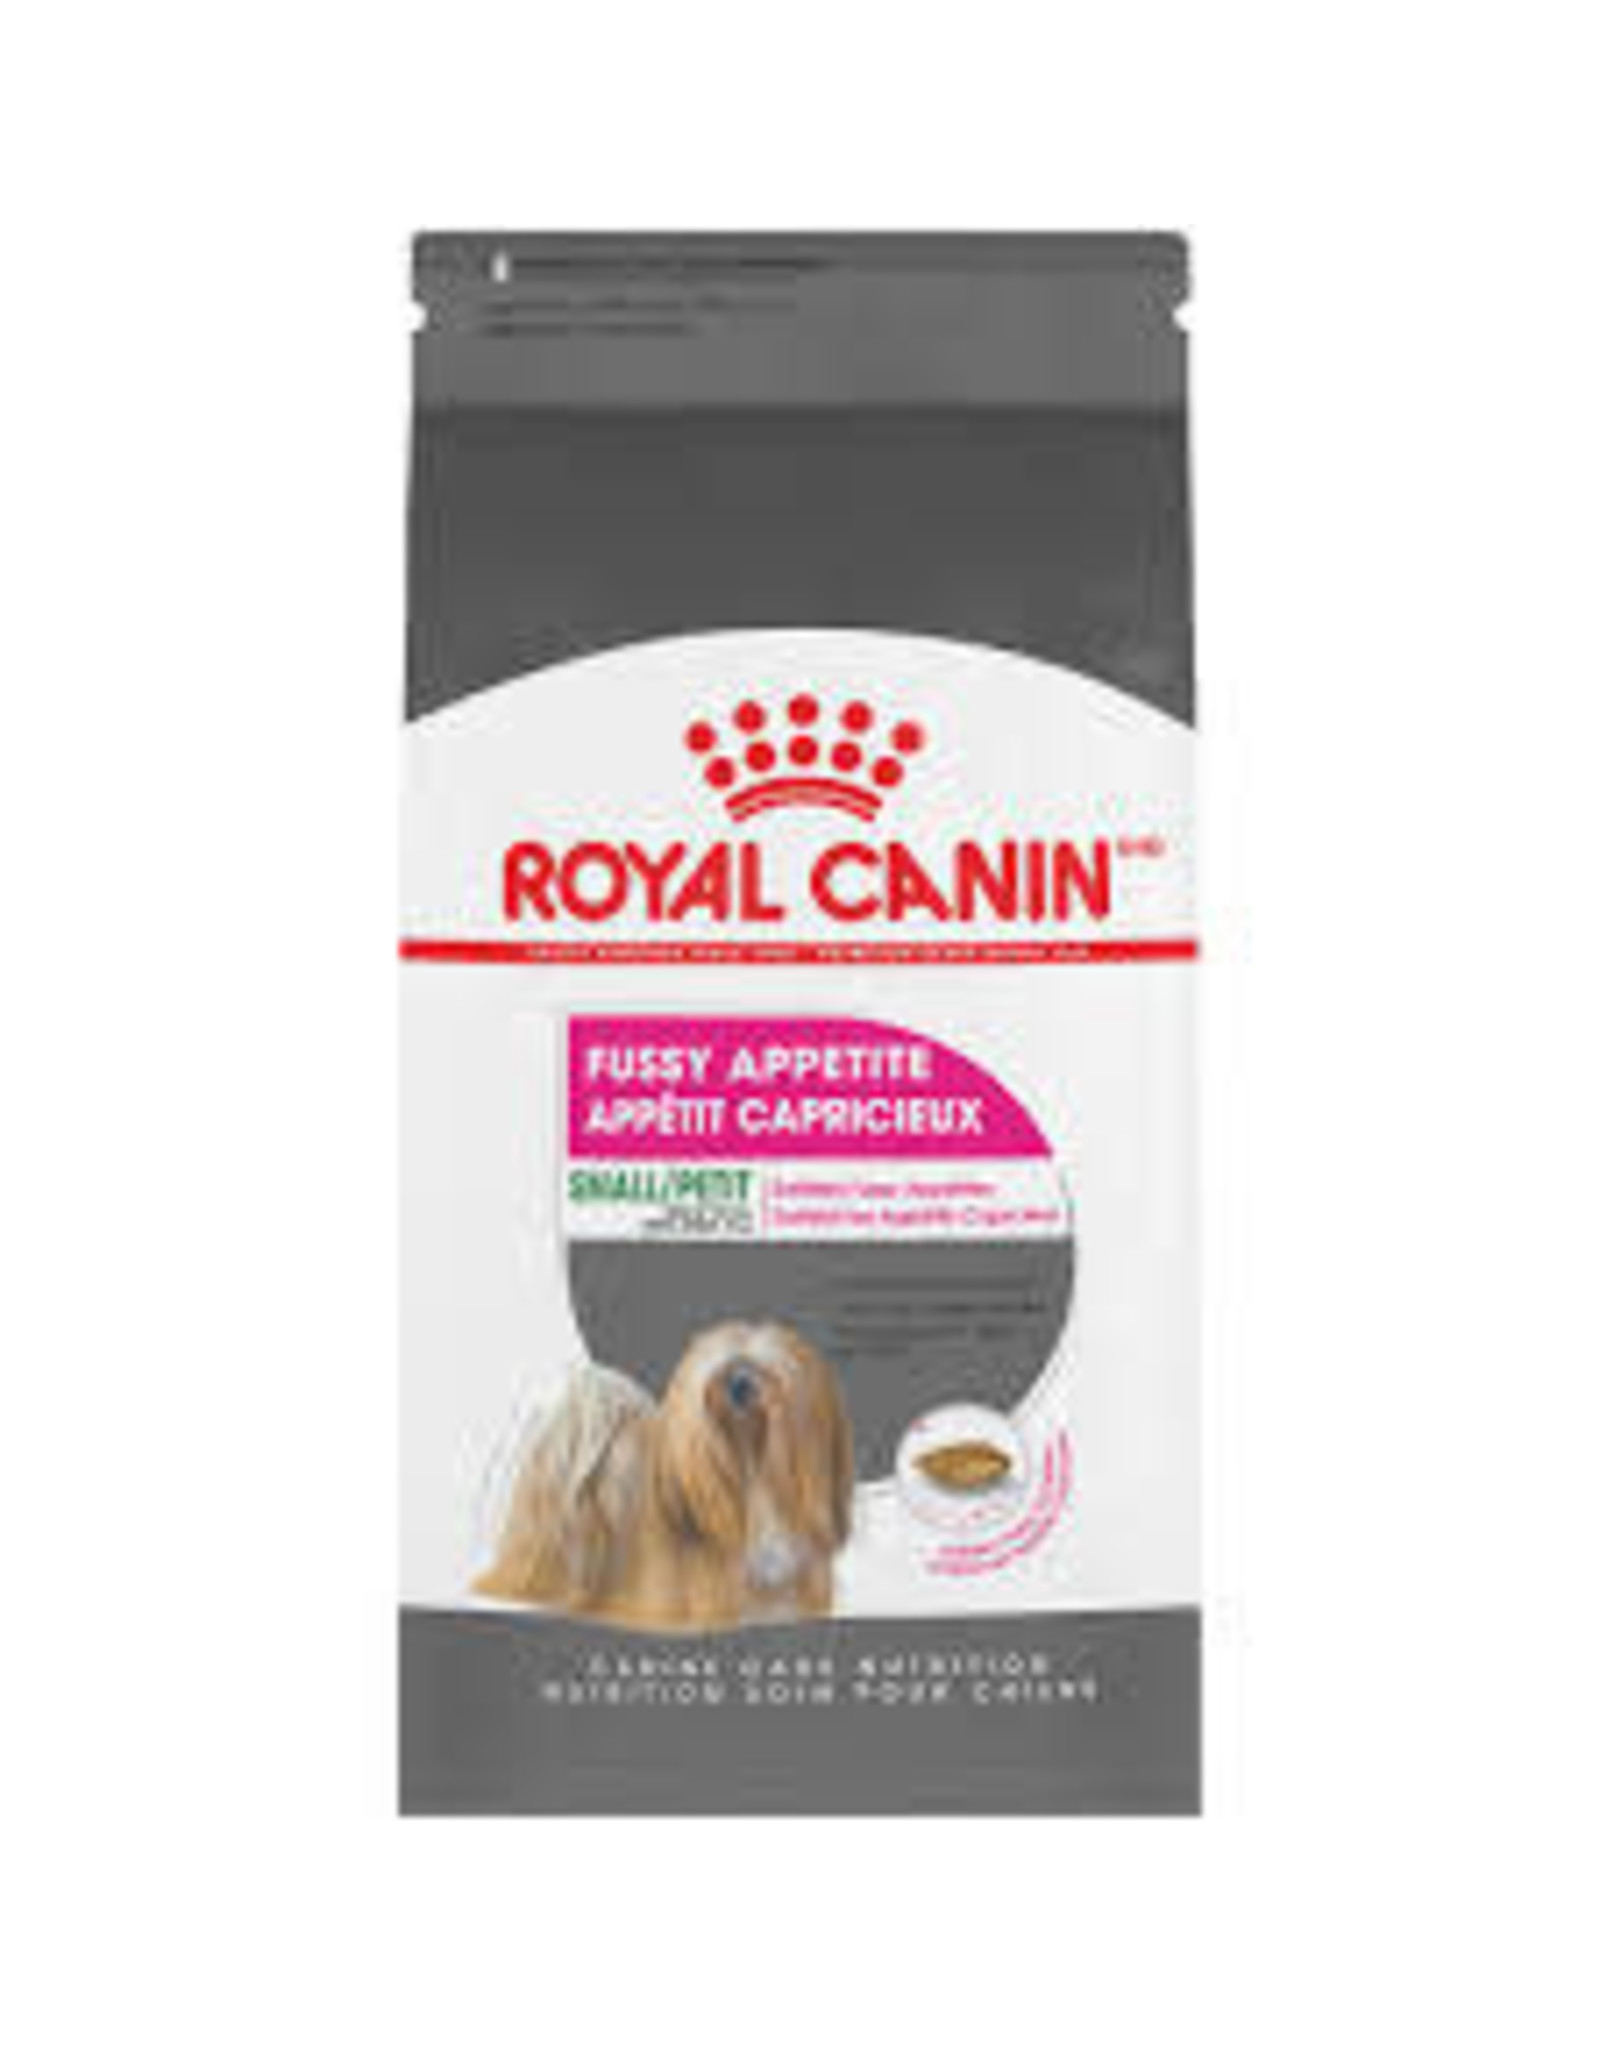 Royal Canin Royal Canin Dog - Fussy Appetite 3.5lb